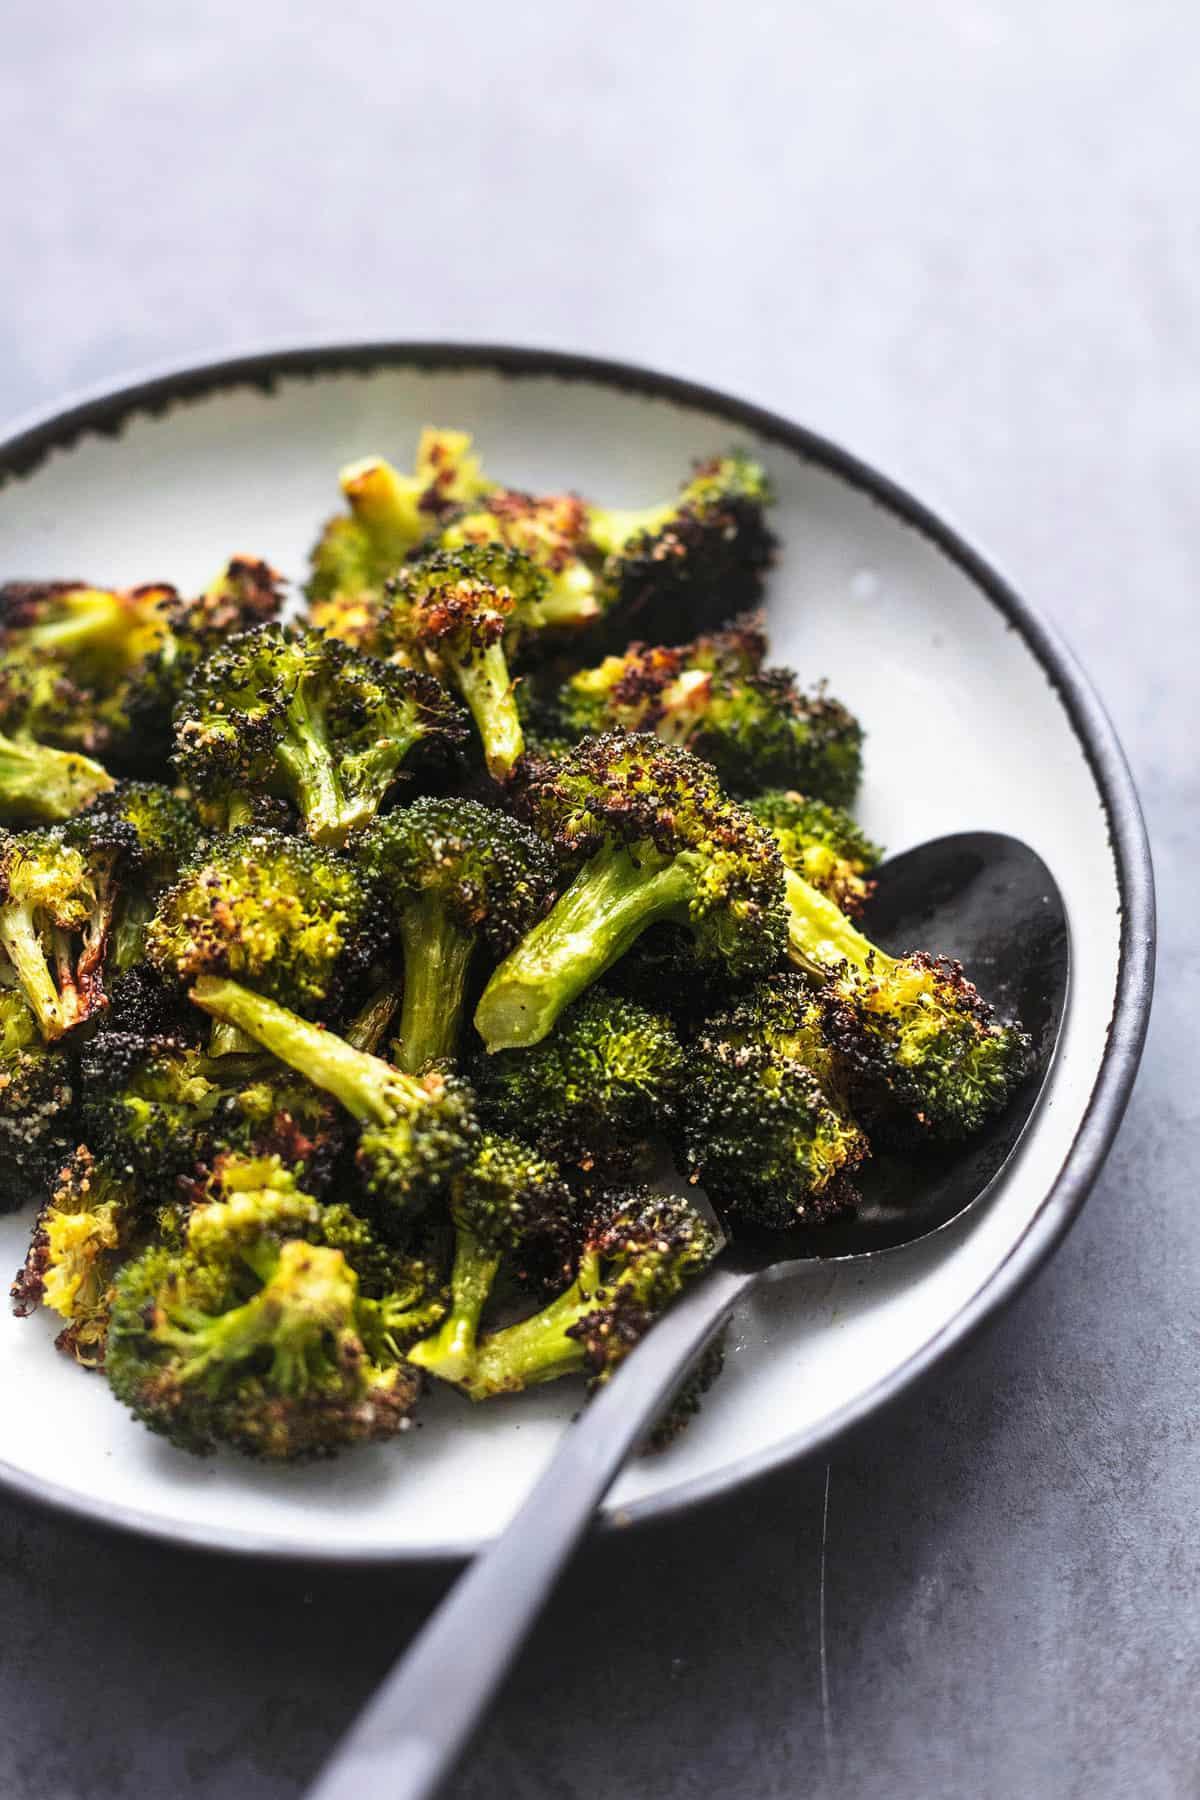 Easy tasty and healthy ROASTED BROCCOLI side dish recipe | lecremedelacrumb.com